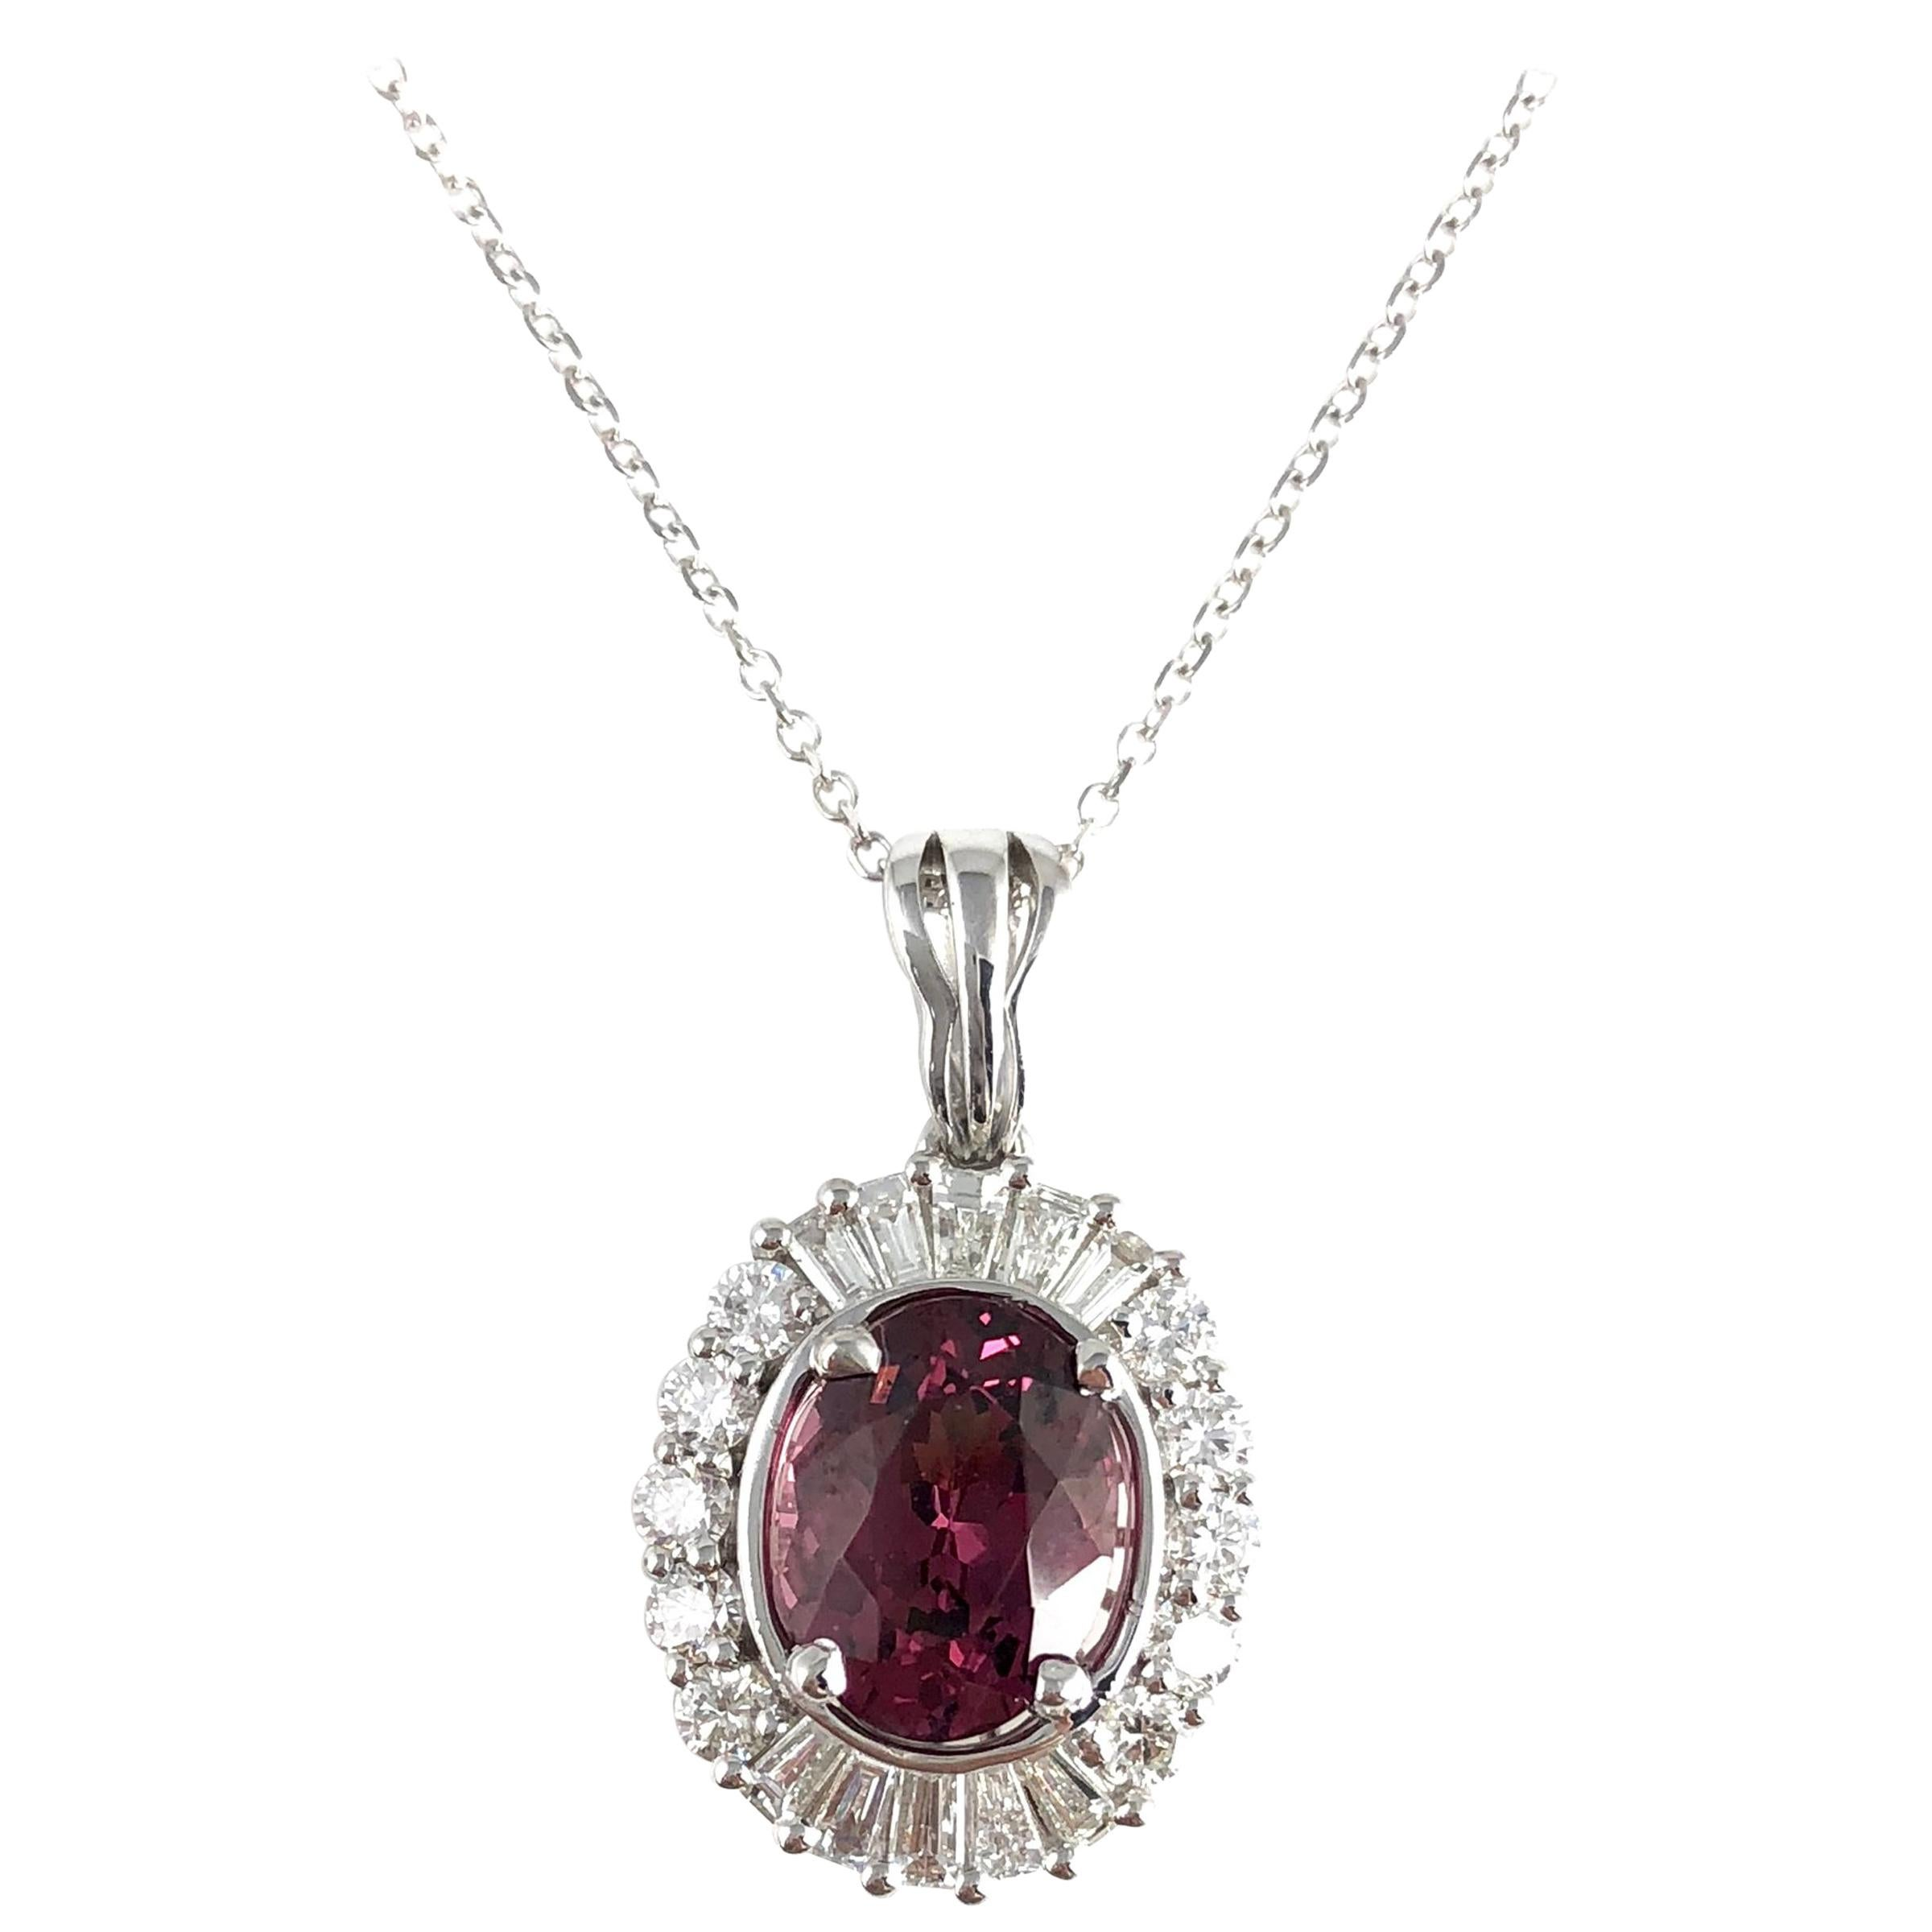 DiamondTown 1.89 Carat Oval Cut Raspberry Garnet and Diamond Halo Pendant